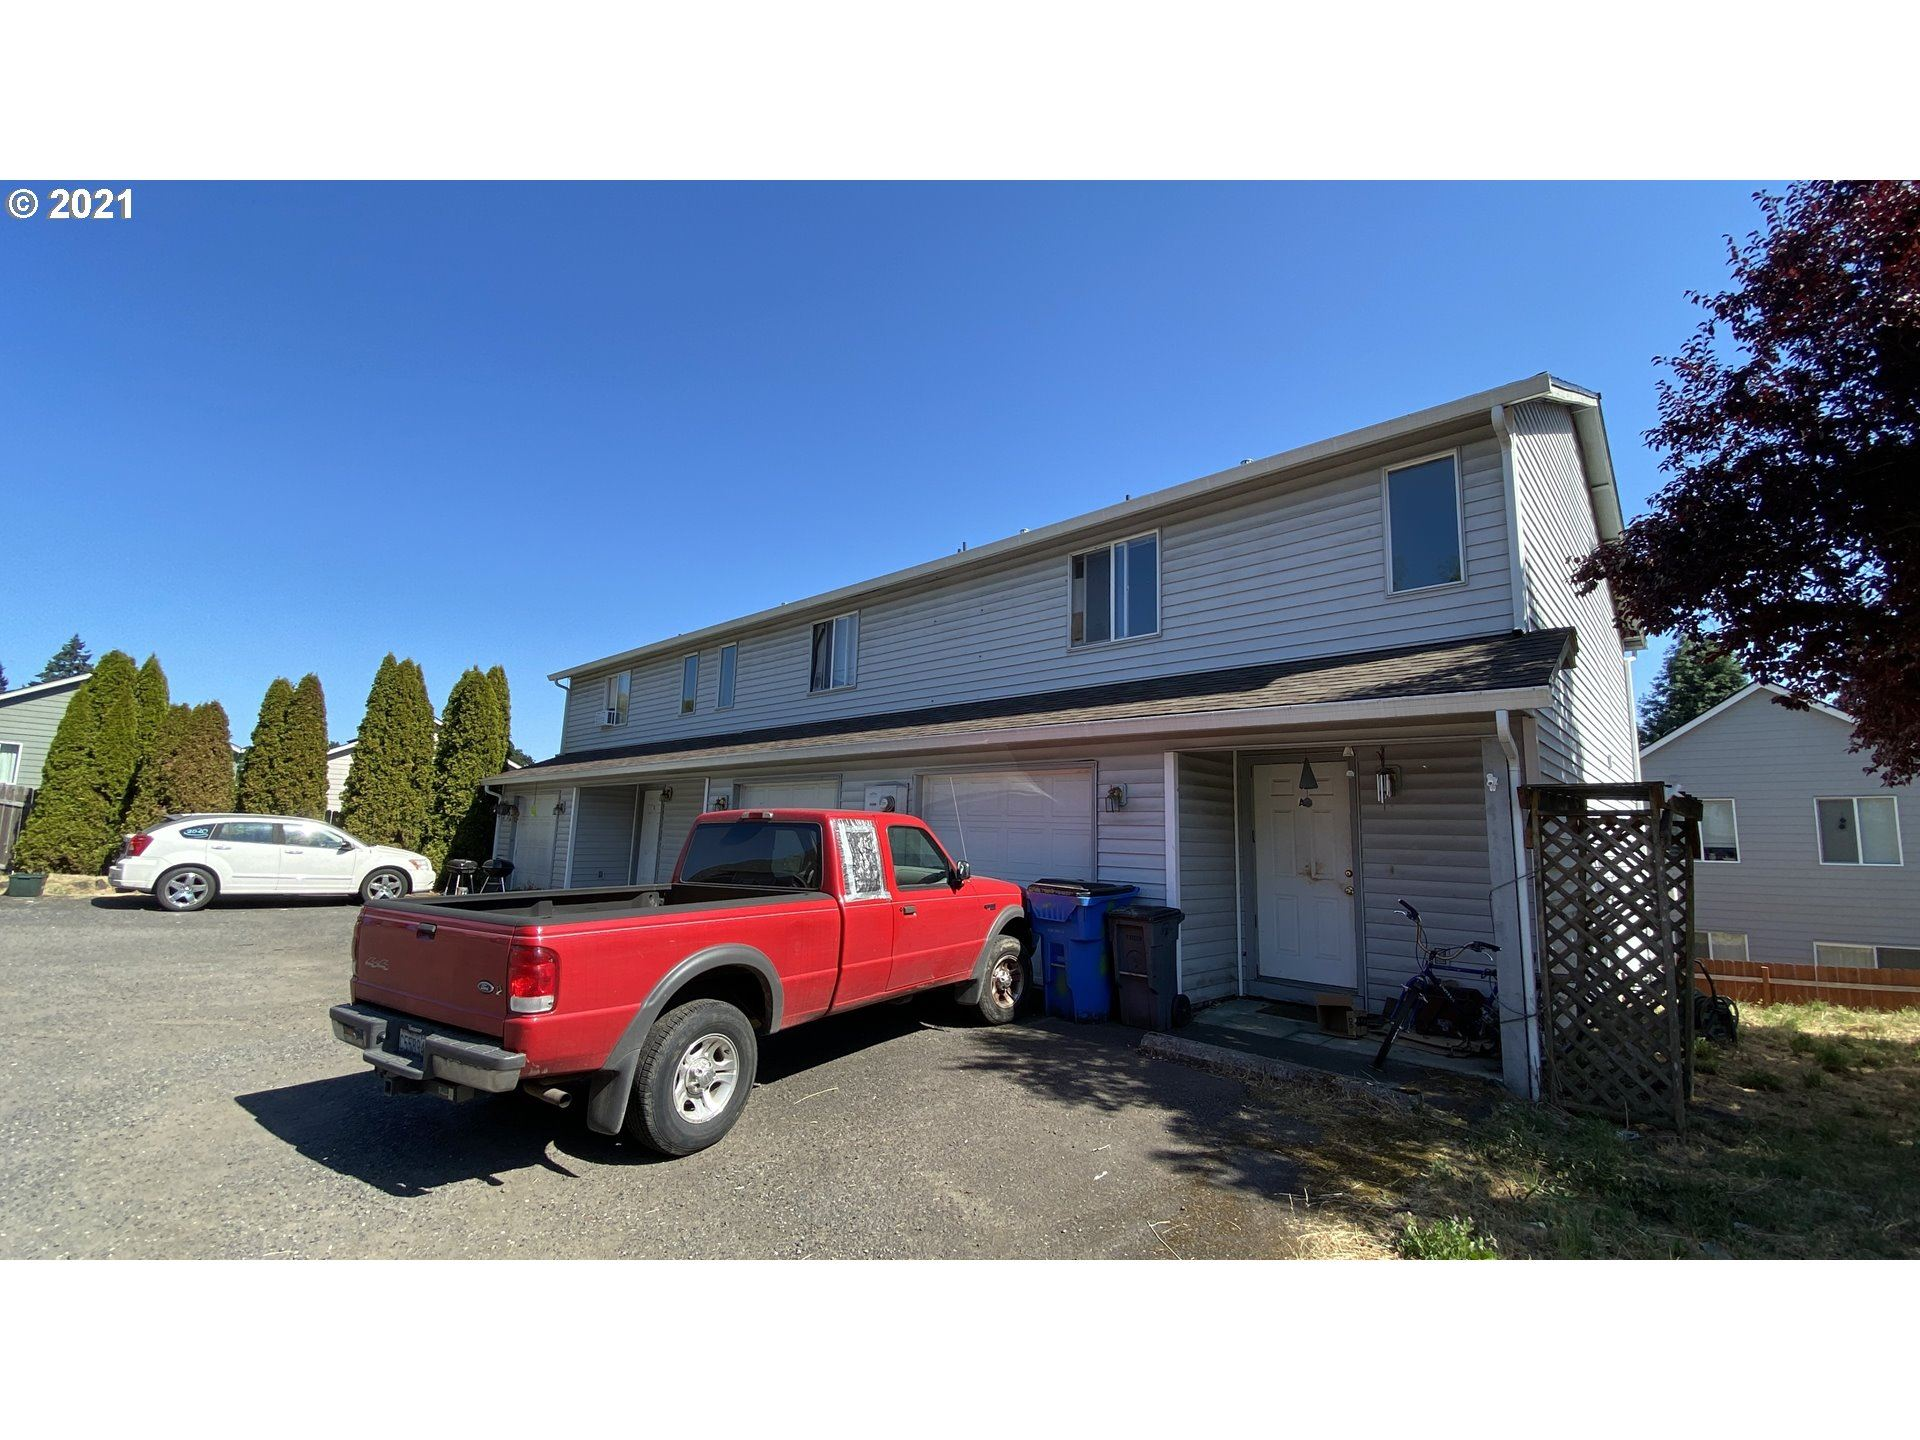 8611 NE 27TH CIR, Vancouver, WA 98662 - MLS#: 21481739